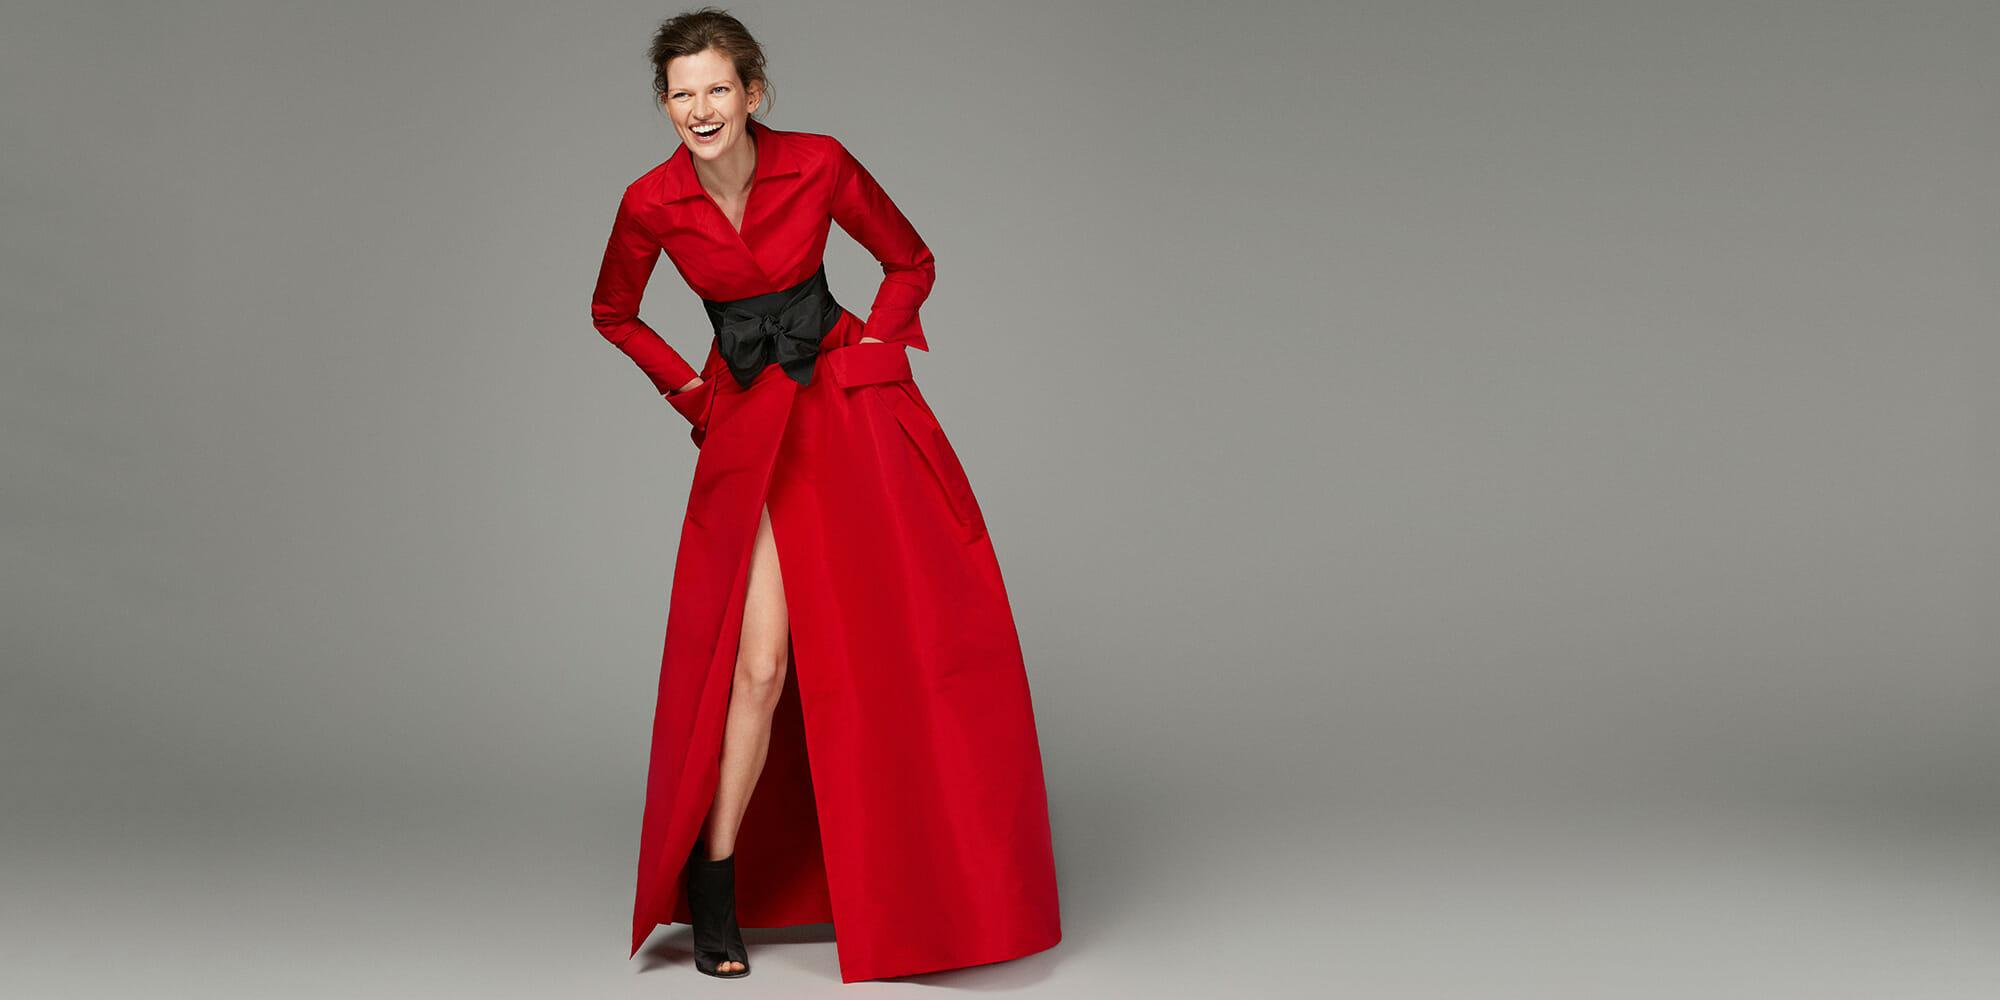 574c5d483 CACHE-COEUR TAFFETA SHIRT DRESS ch carolina herrera red dress